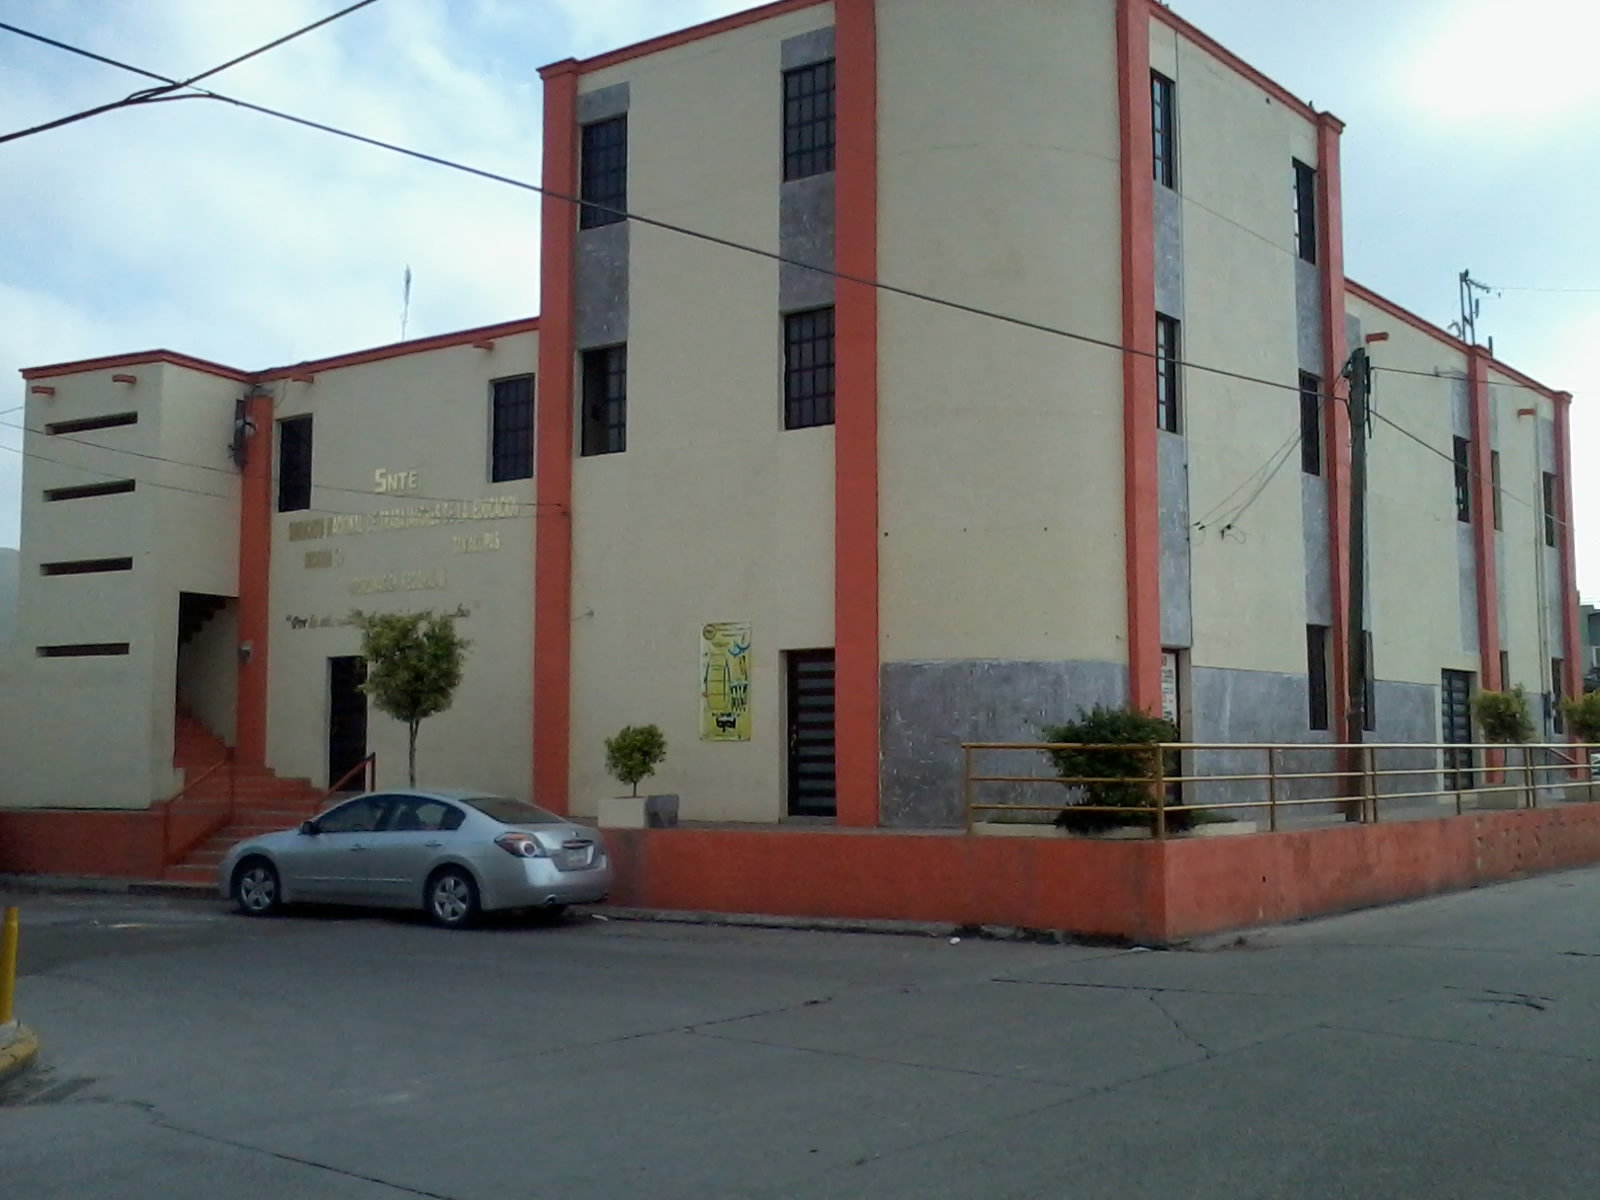 Casa de la cultura de matamoros centros culturales m xico sistema de informaci n cultural - Apartamentos la marina laredo ...